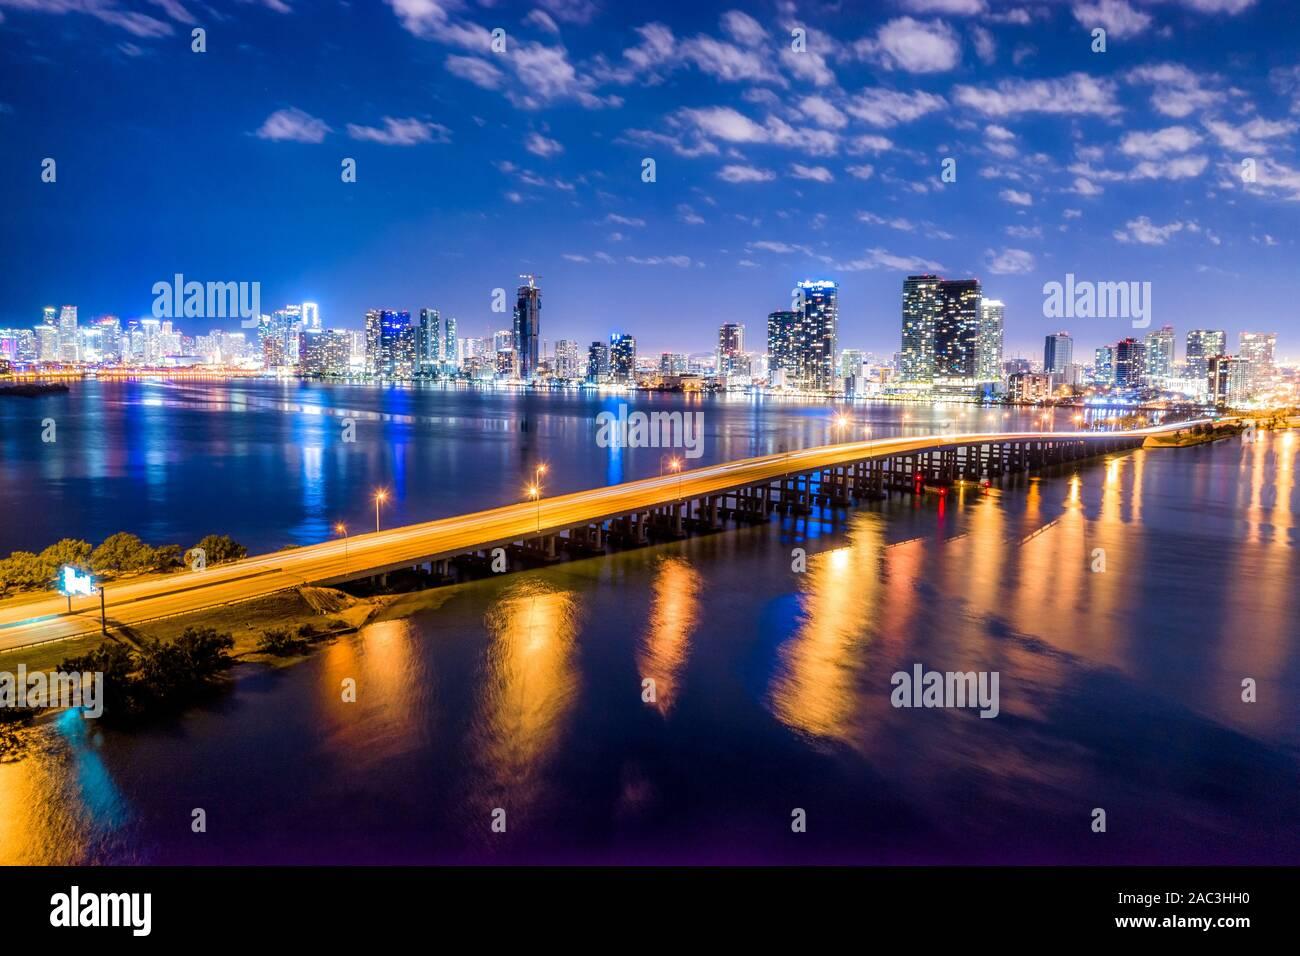 Antenna skyline di Miami notte lunga esposizione a Miami Beach e MacArthur Causeway Foto Stock